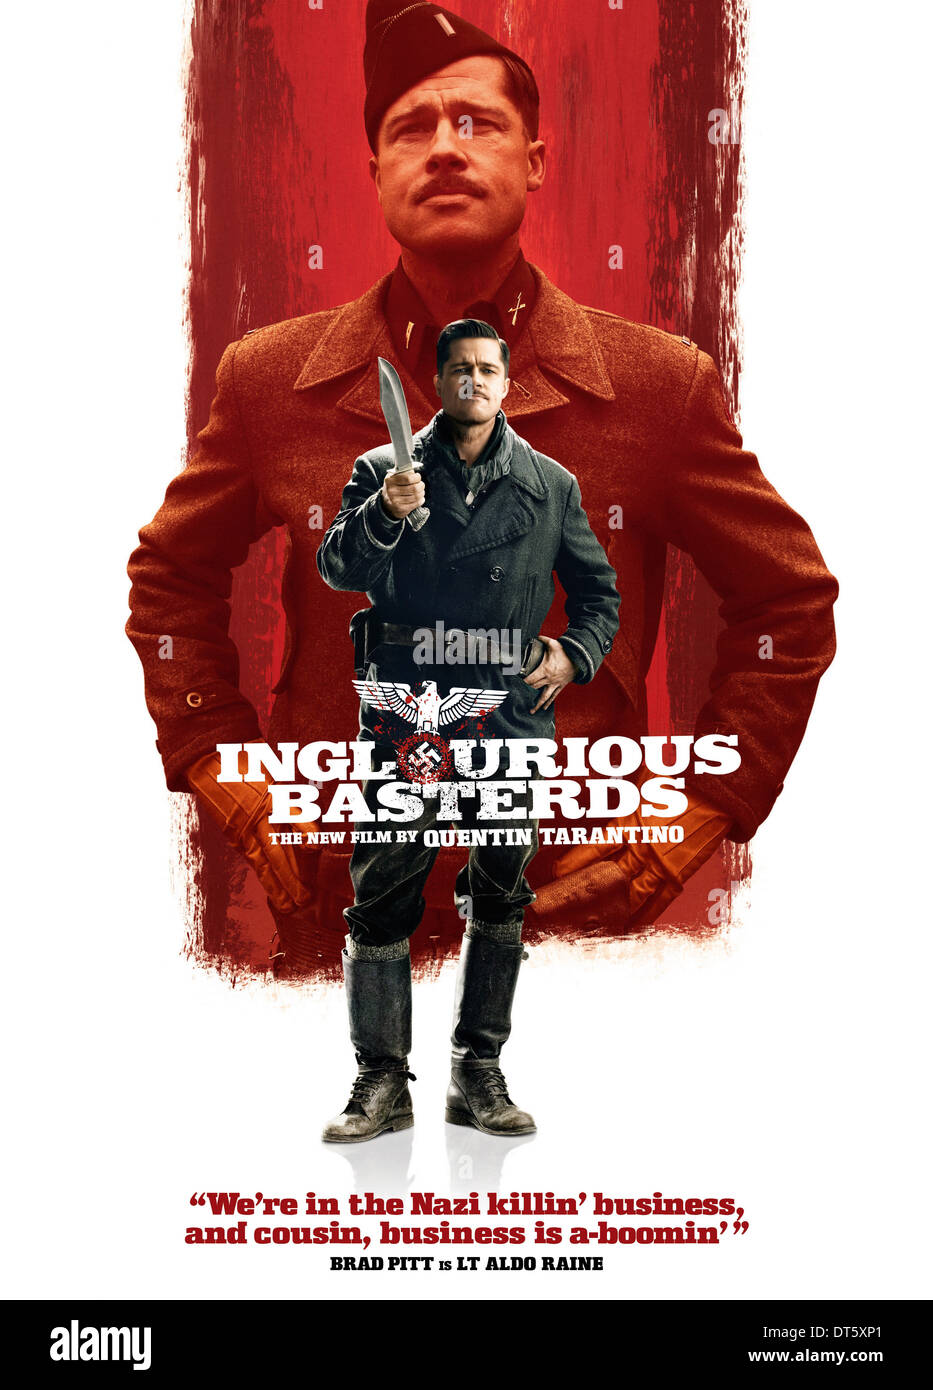 Inglourious Basterds-Luxury Framed Movie Poster-Quentin Tarantino-Brad Pitt